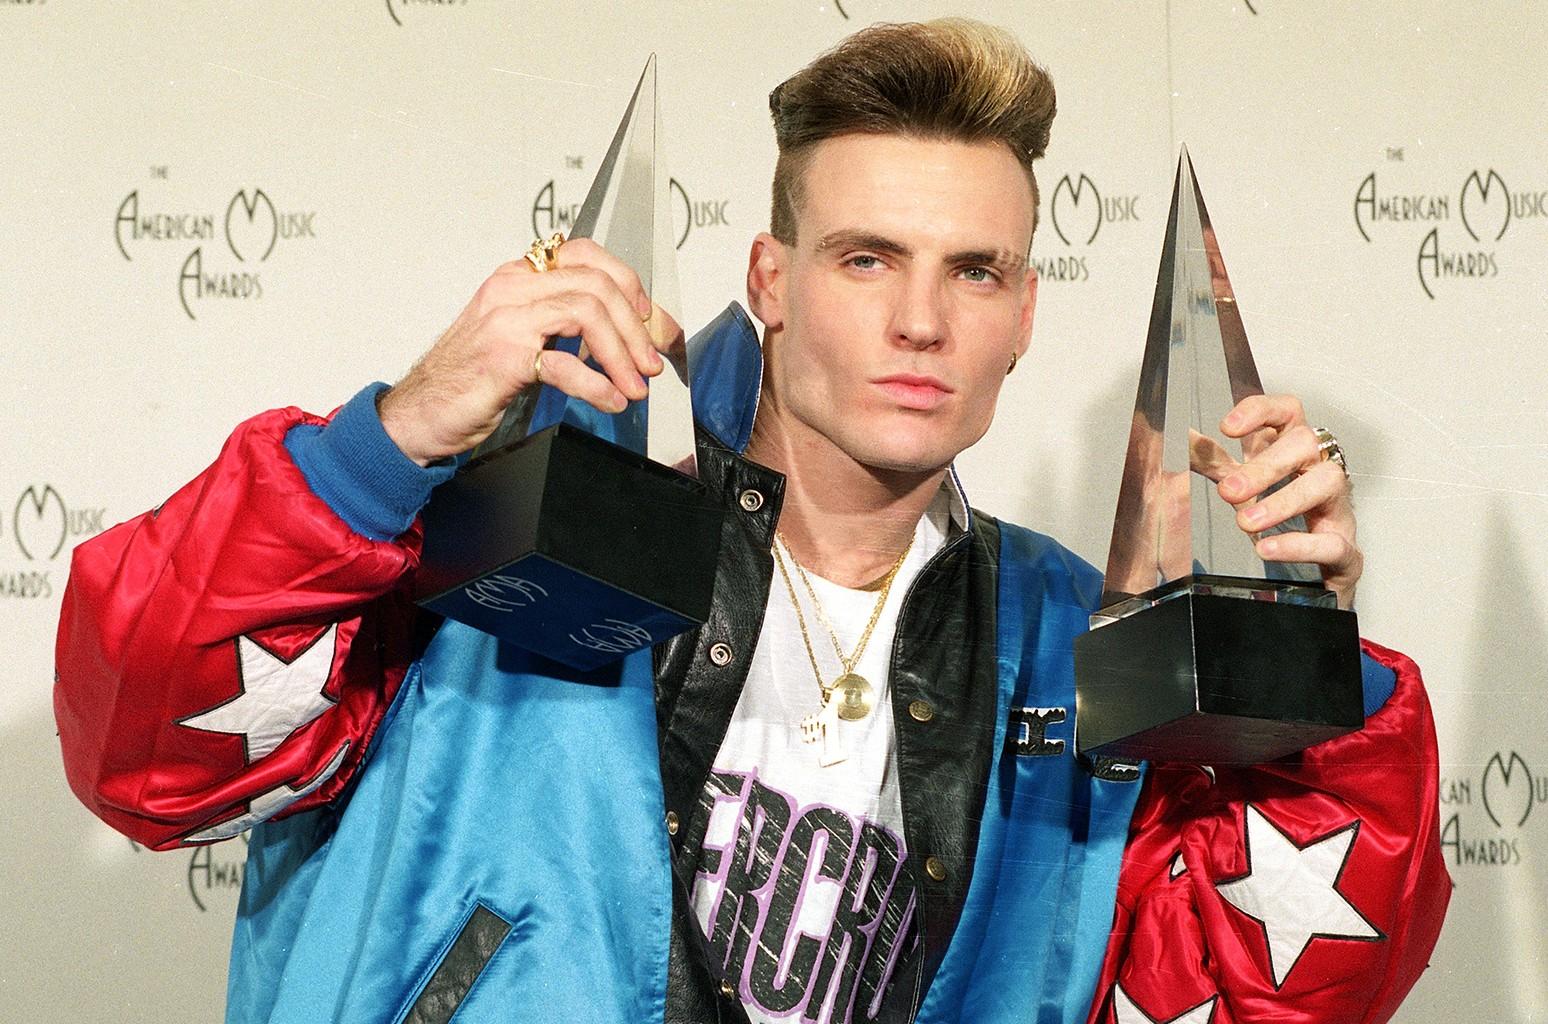 Vanilla Ice at the American Music Awards